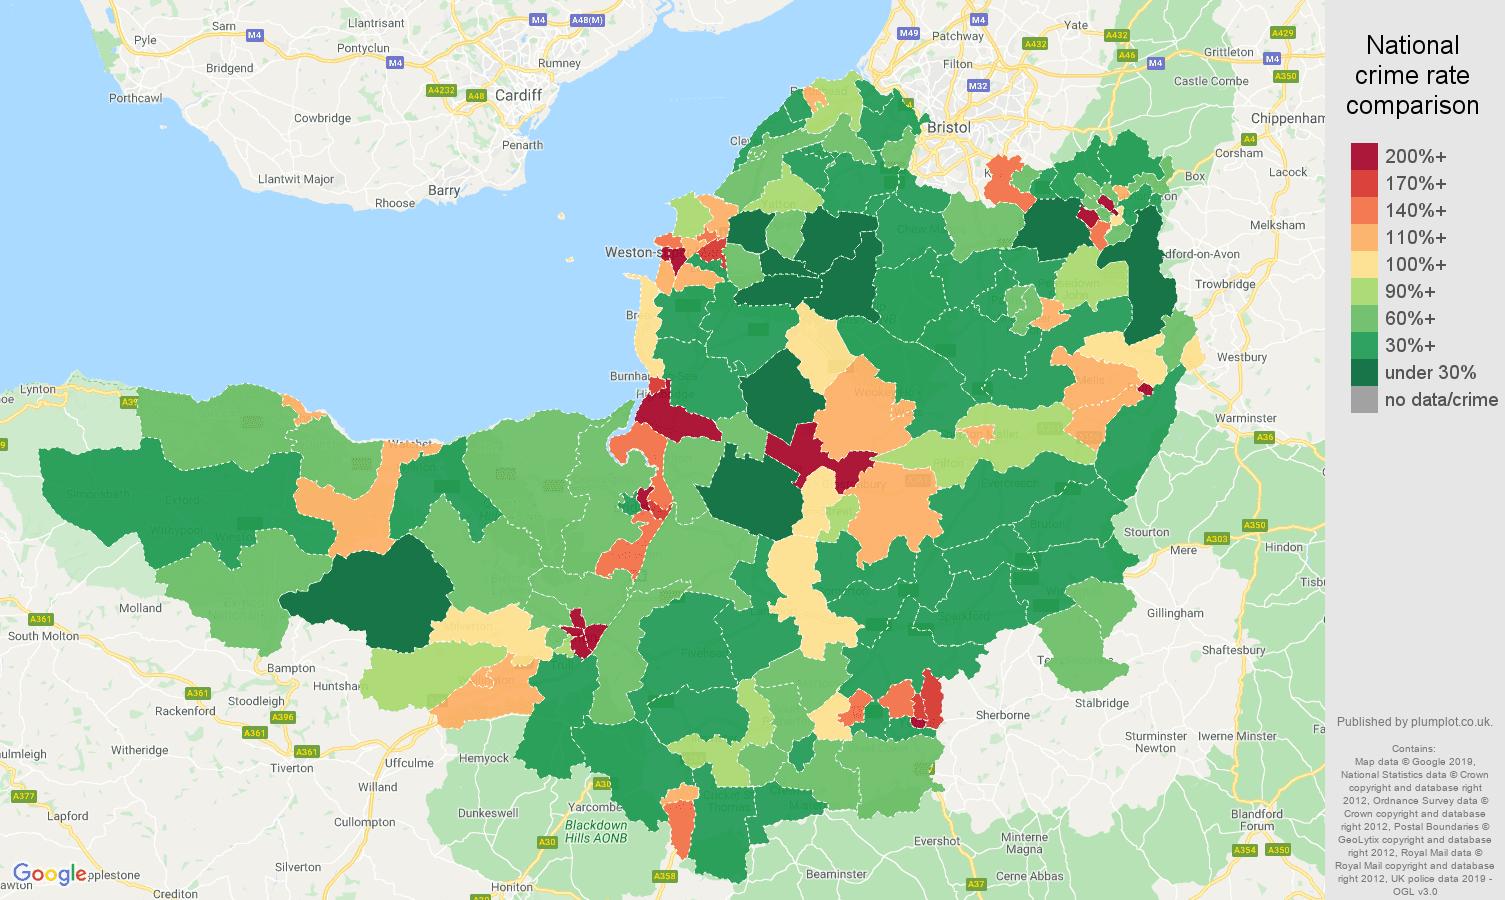 Somerset public order crime rate comparison map